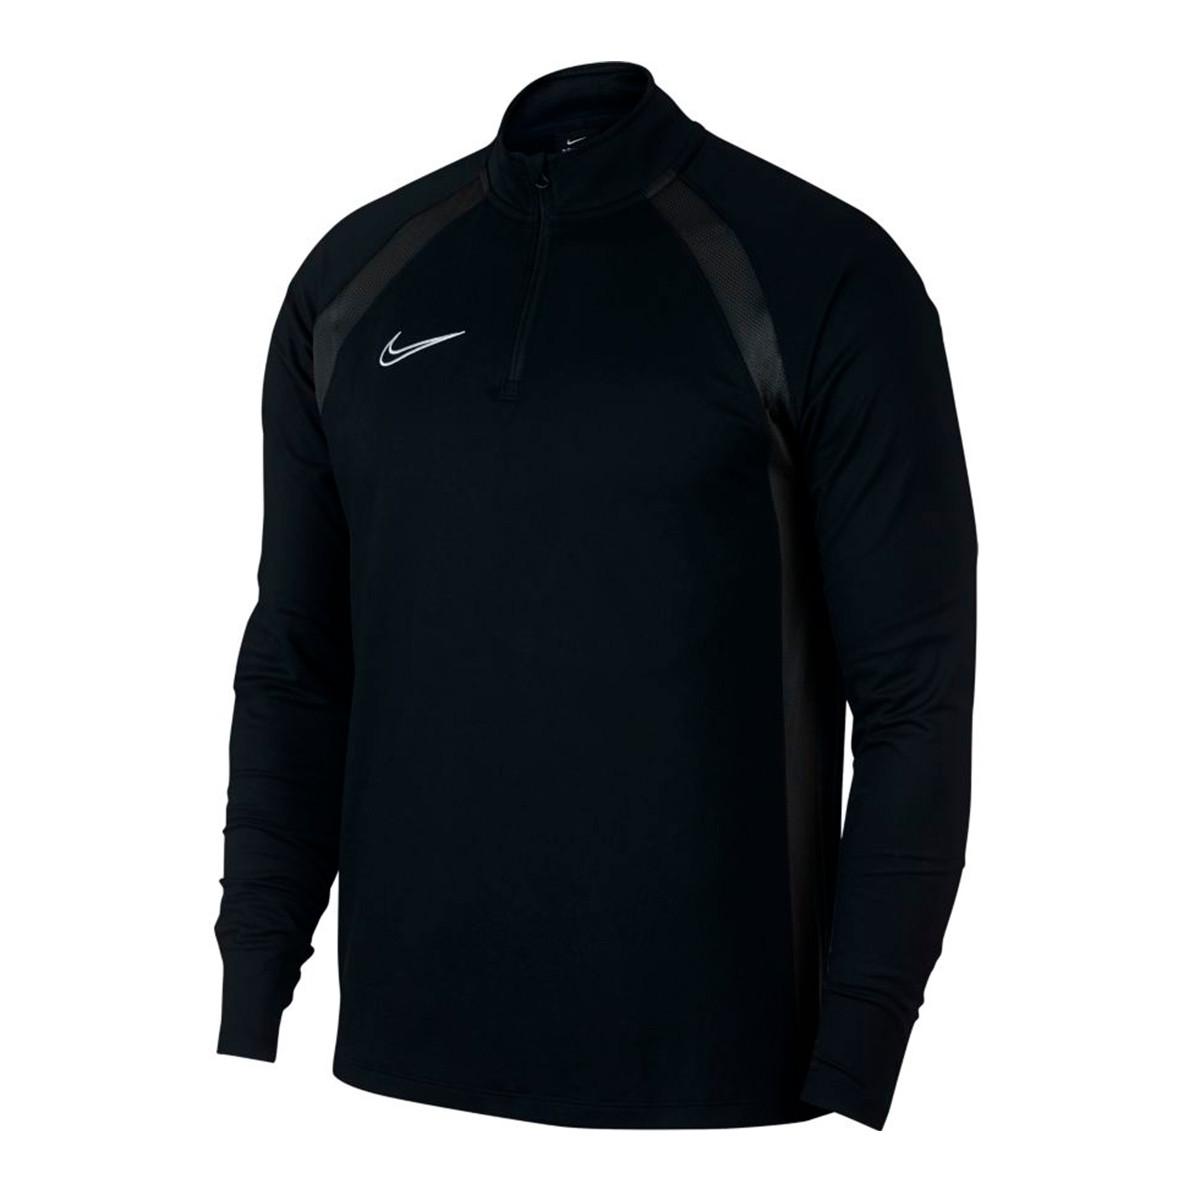 9a585f41 Playera Nike Dry Academy Dril Top Black-Anthracite - Tienda de fútbol  Fútbol Emotion